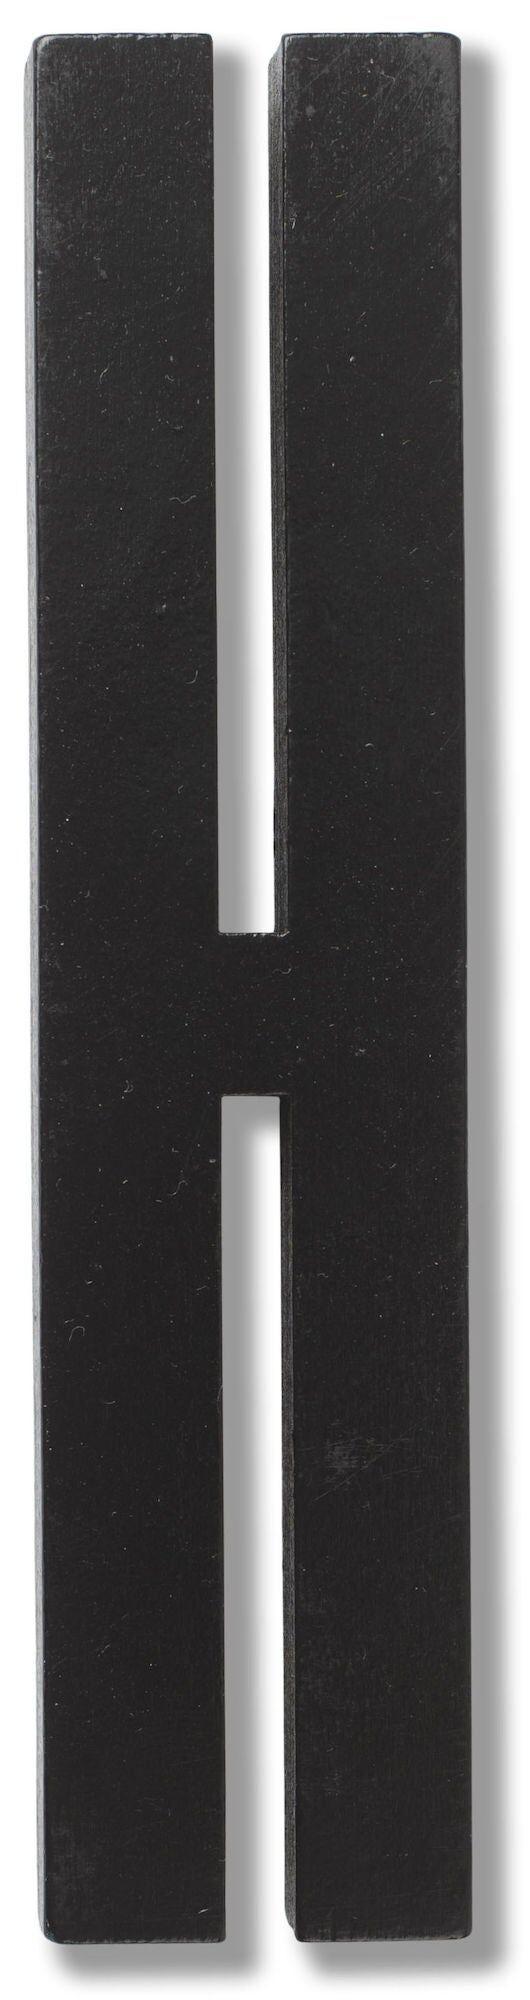 Design Letters Buchstabe Holz, Black H